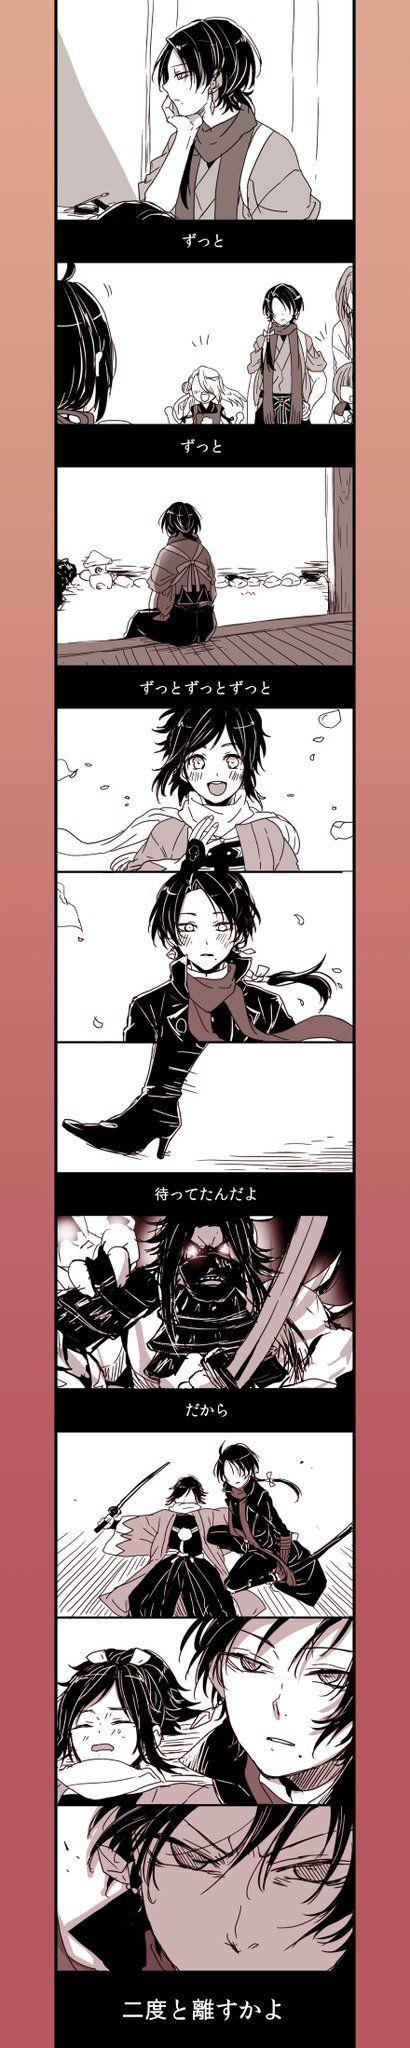 Ahhhhh QAQ It's just like the spoiler of ep 12 Touken Ranbu Hanamaru